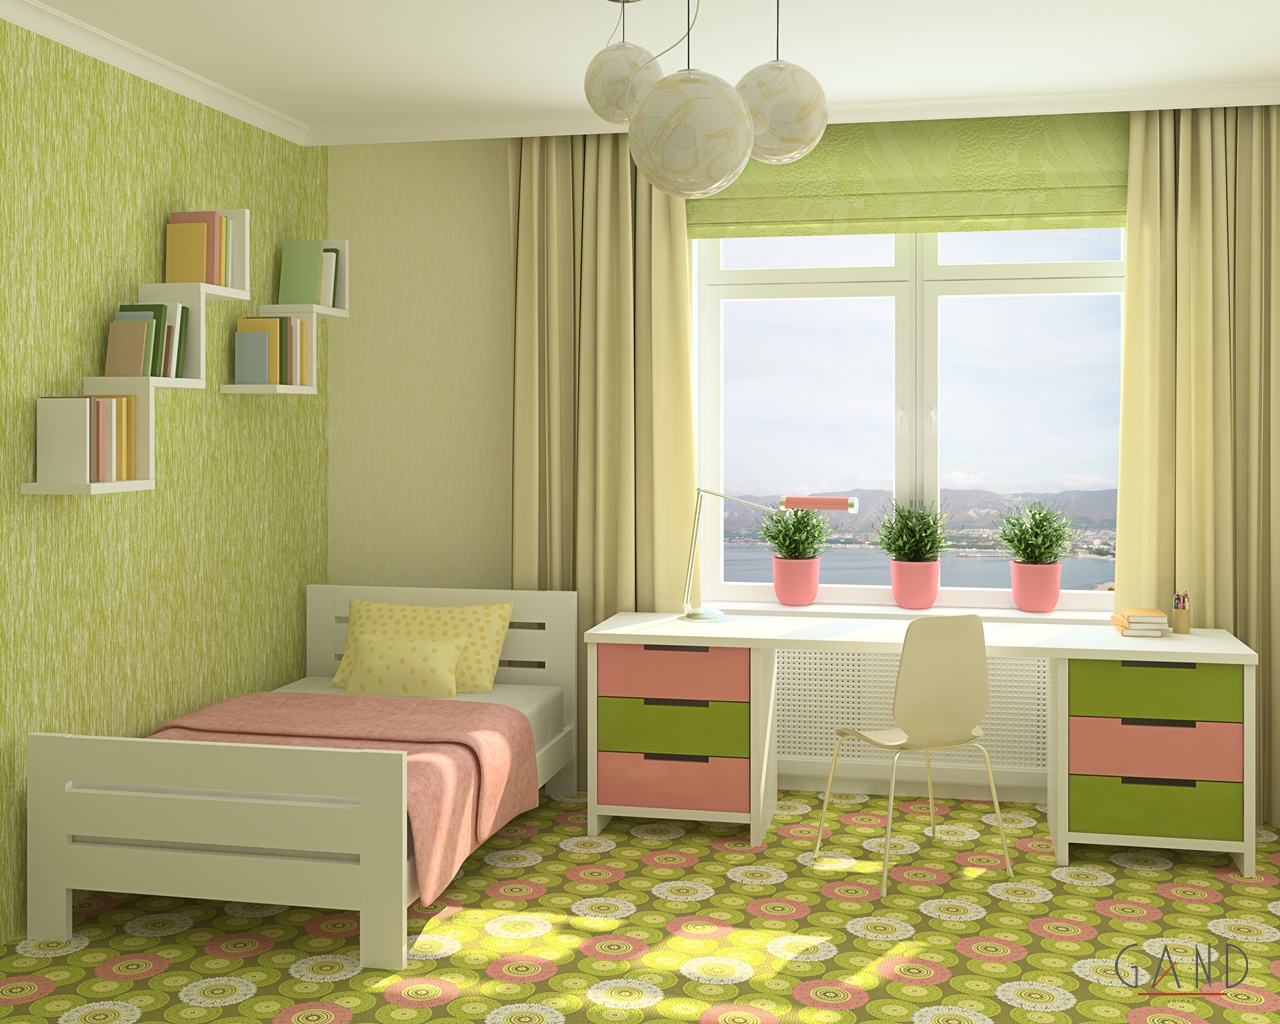 green bedromm